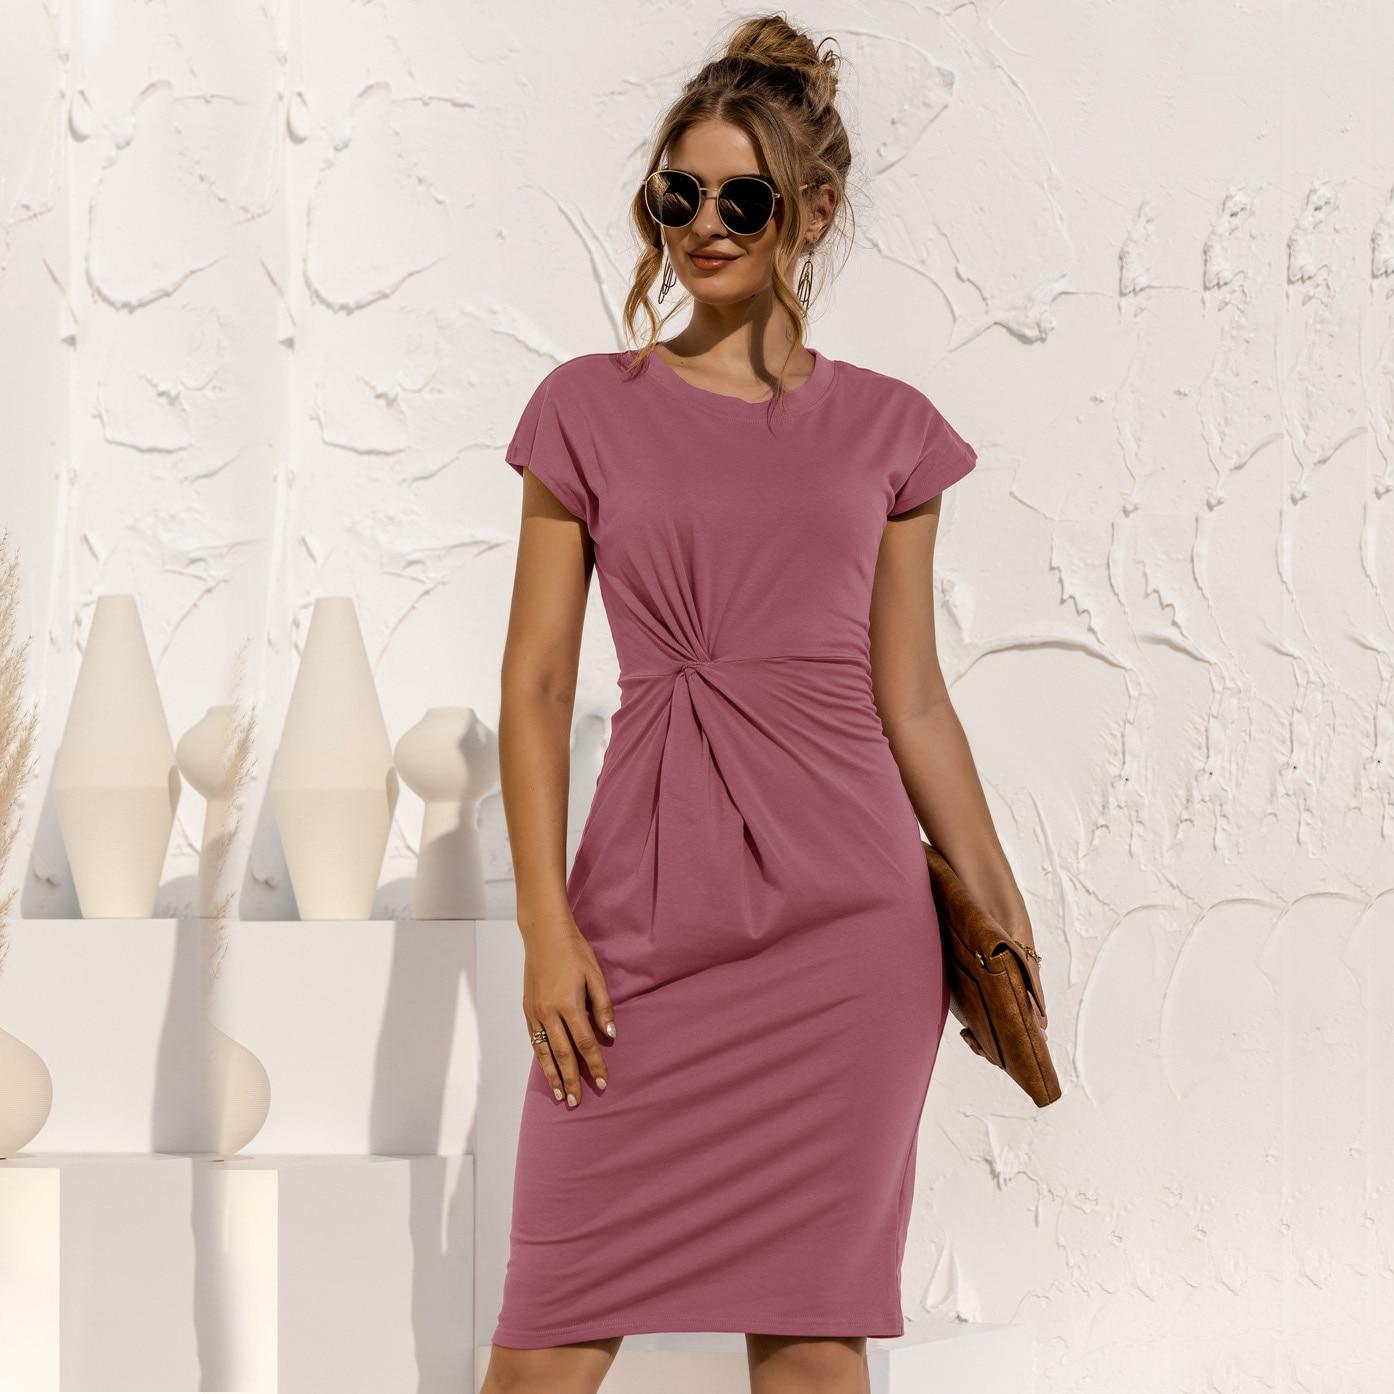 women knitted slim dress 202 summer Trumpet O-Neck short sleeve Empire Waist Slim Solid Straps Mid-calf knitted Dress 9